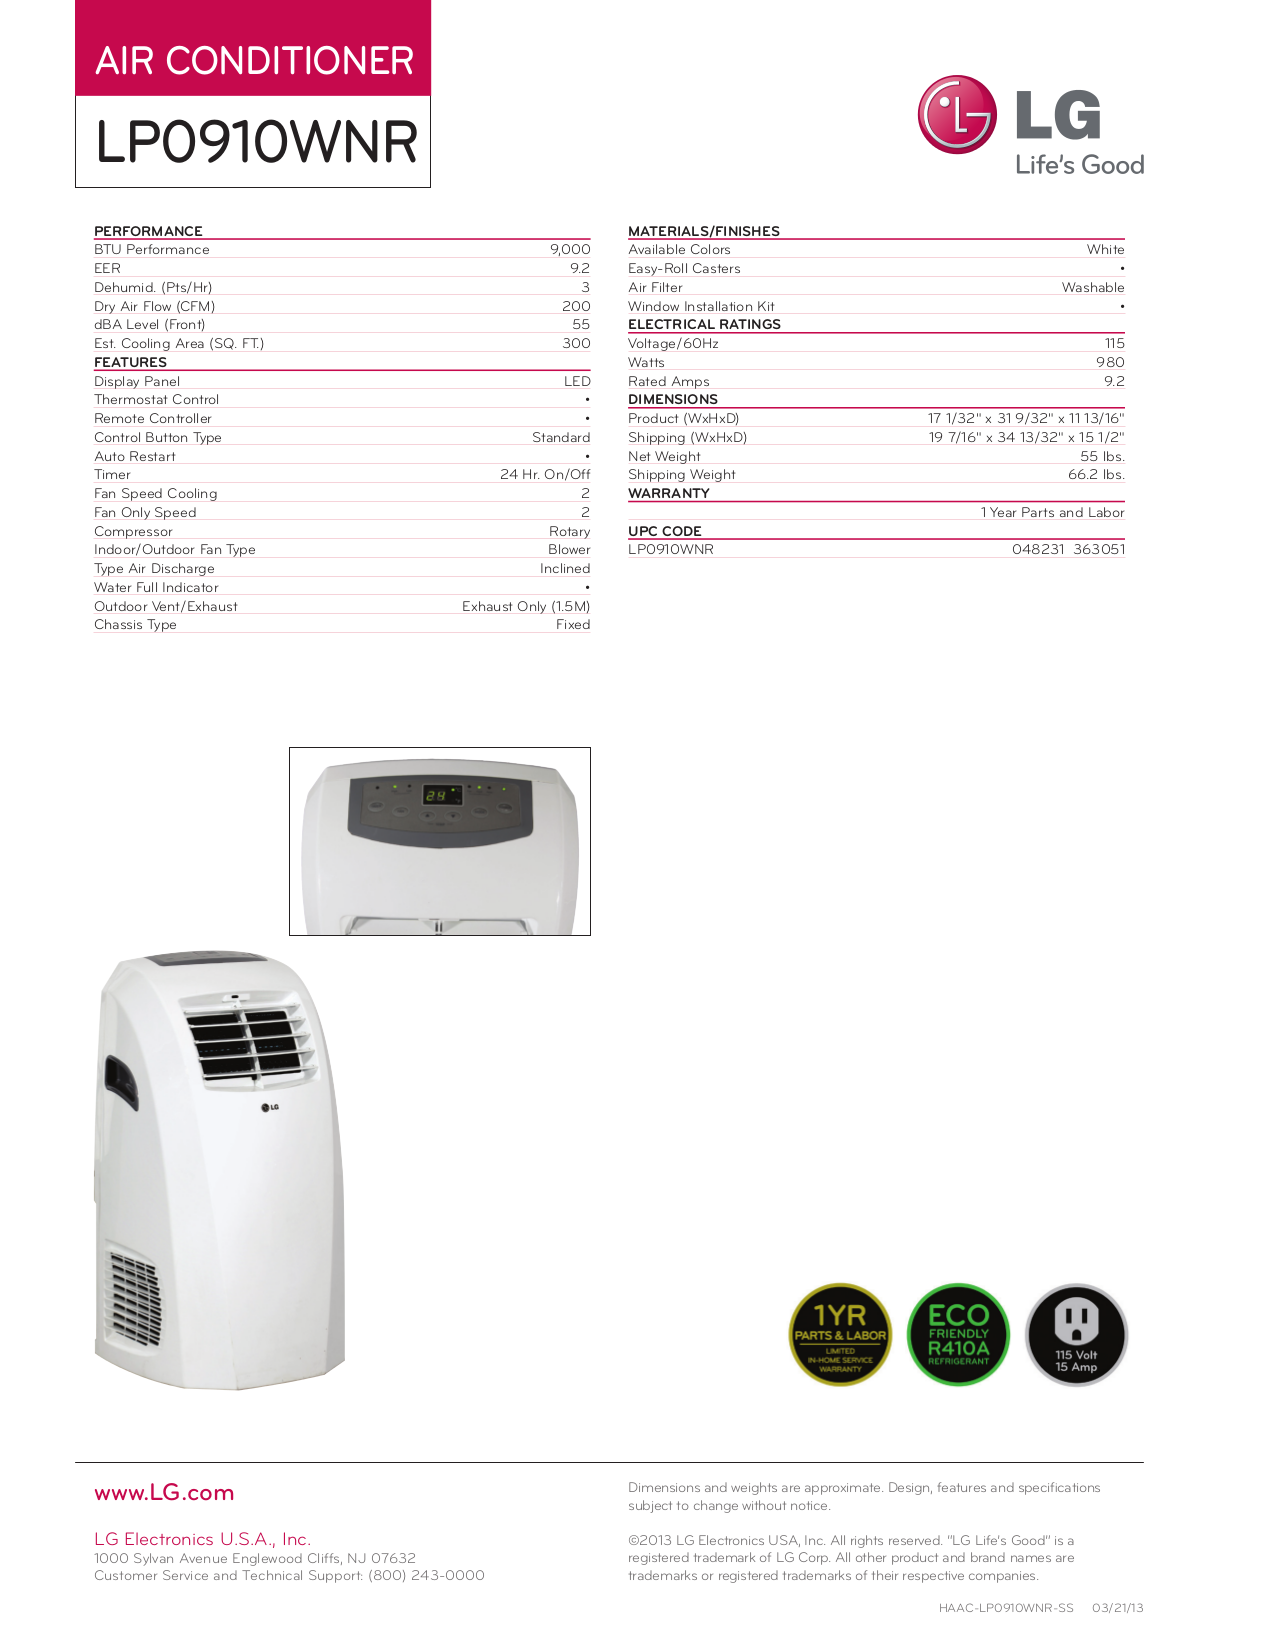 lg model lp0910wnr manual daily instruction manual guides u2022 rh testingwordpress co LG Portable Air Conditioner Manual Flashing FL LG Portable Air Conditioner Manual